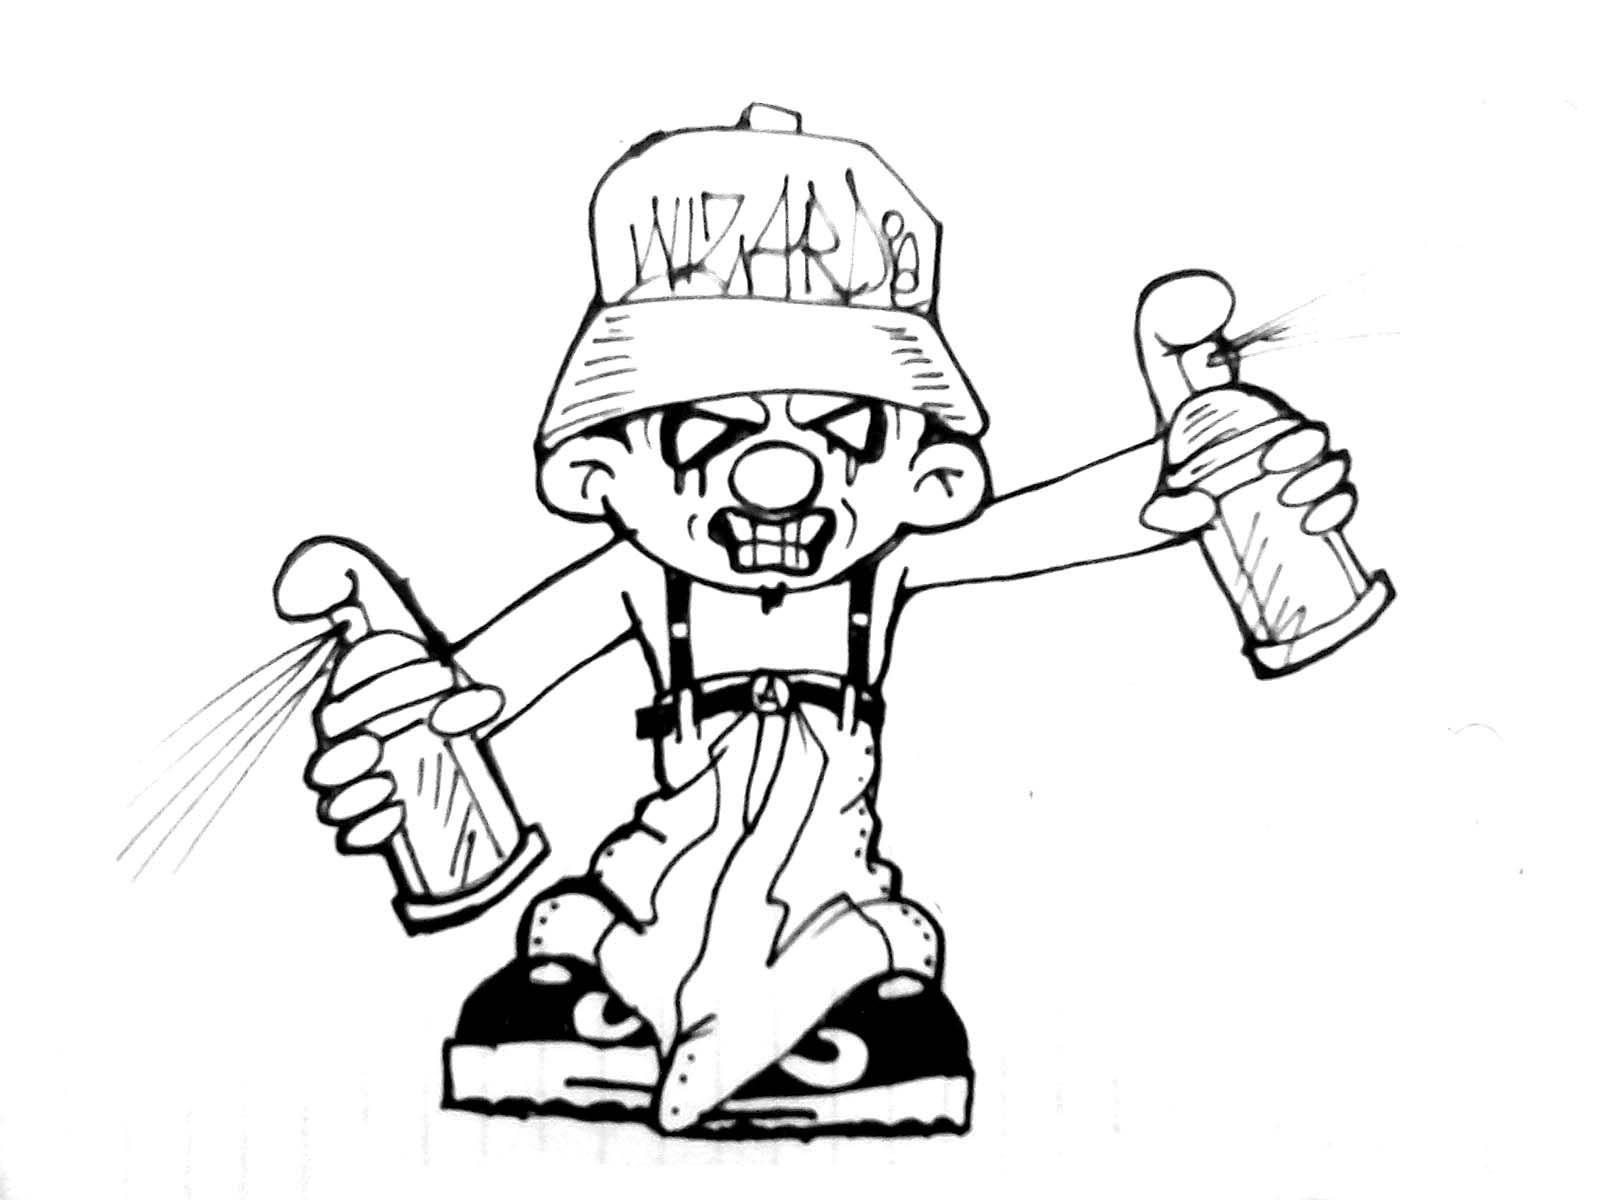 1600x1200 How To Draw A Cholo Smurf